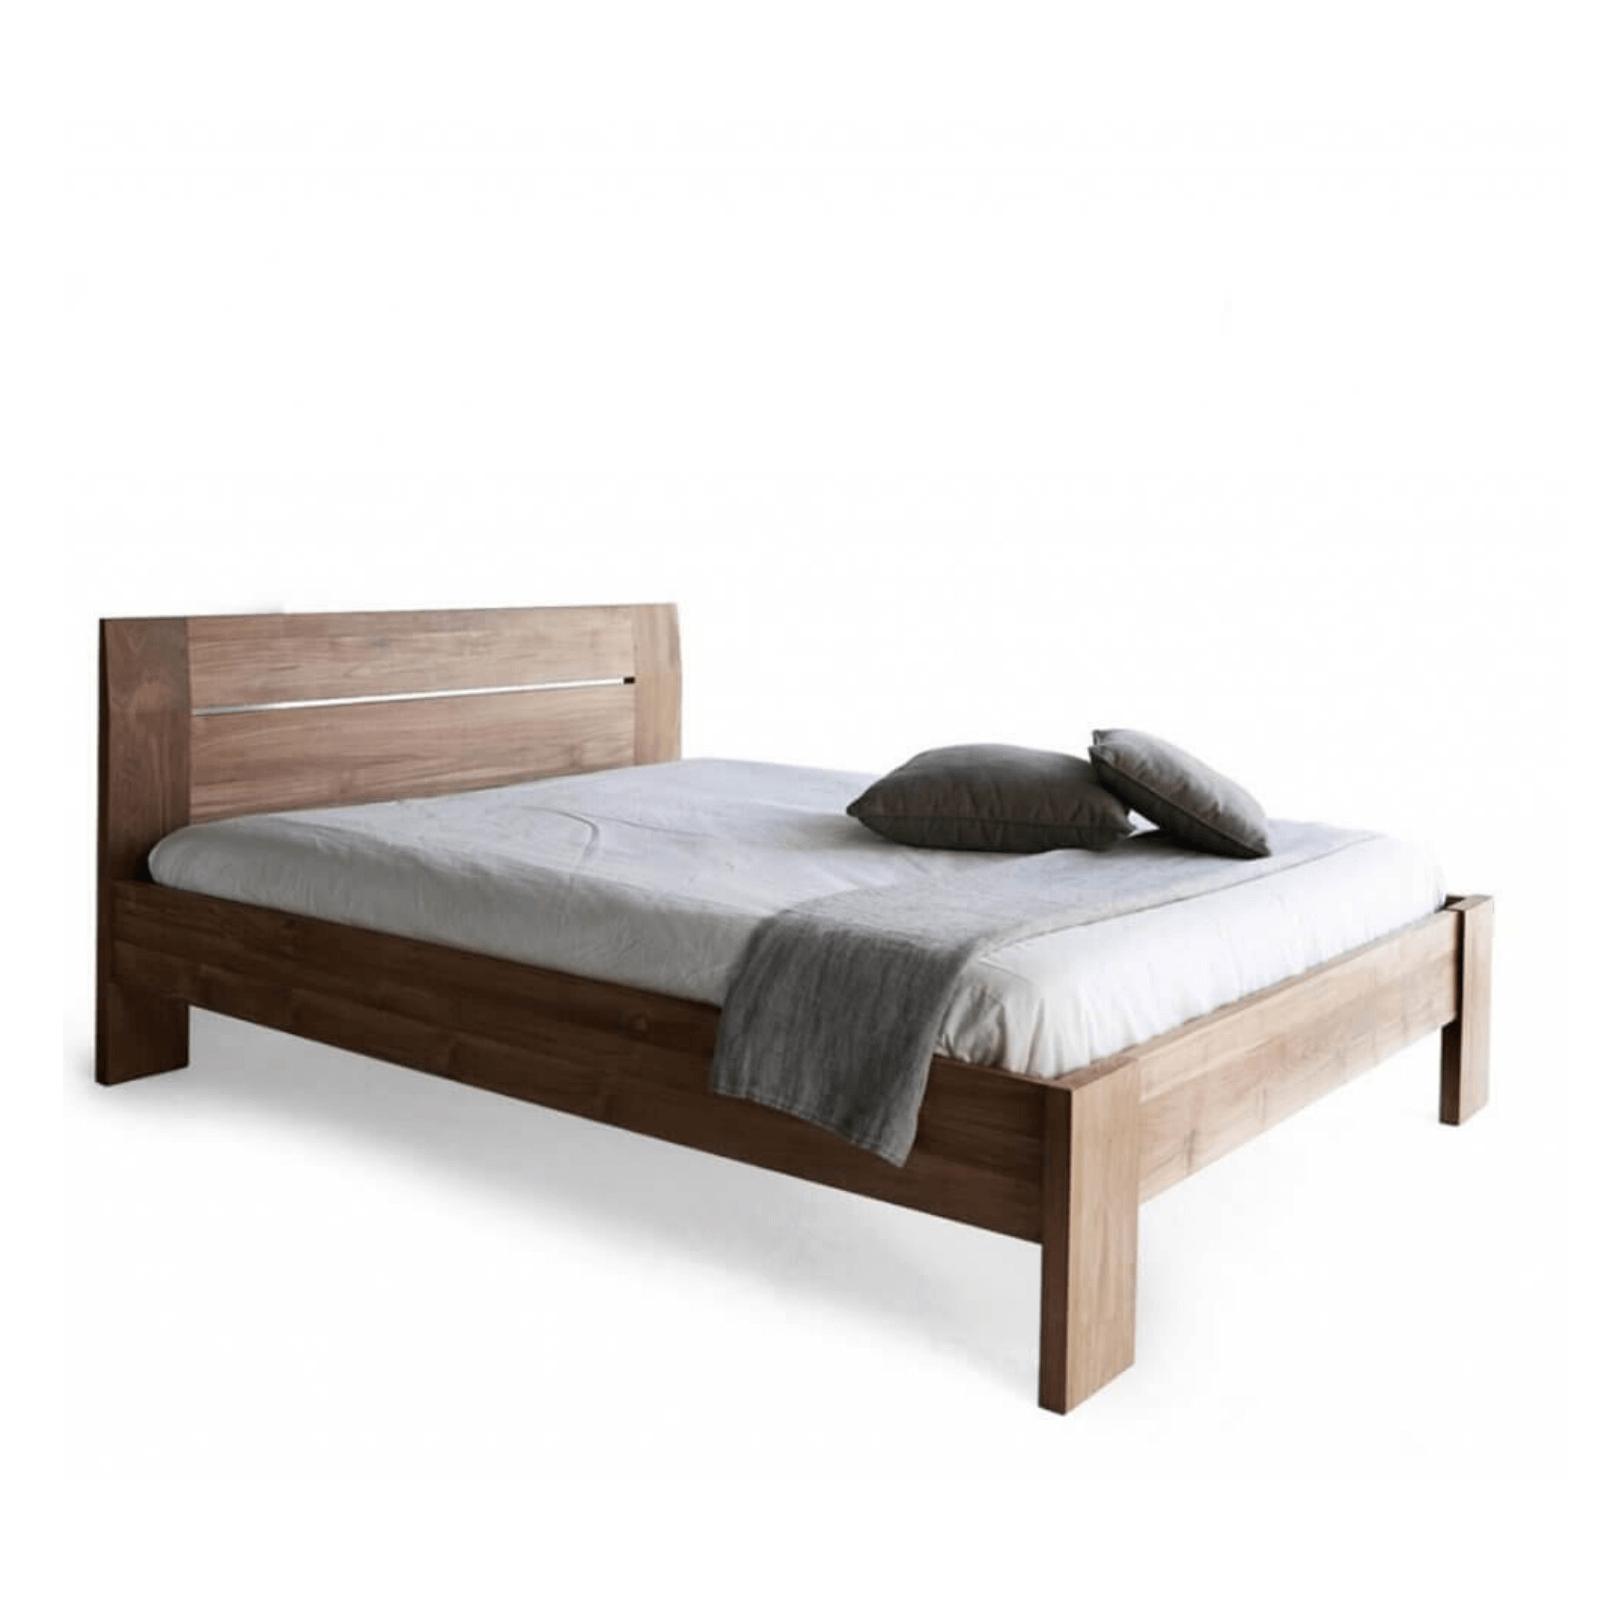 Two Design Lovers Ethnicraft Teak Bed